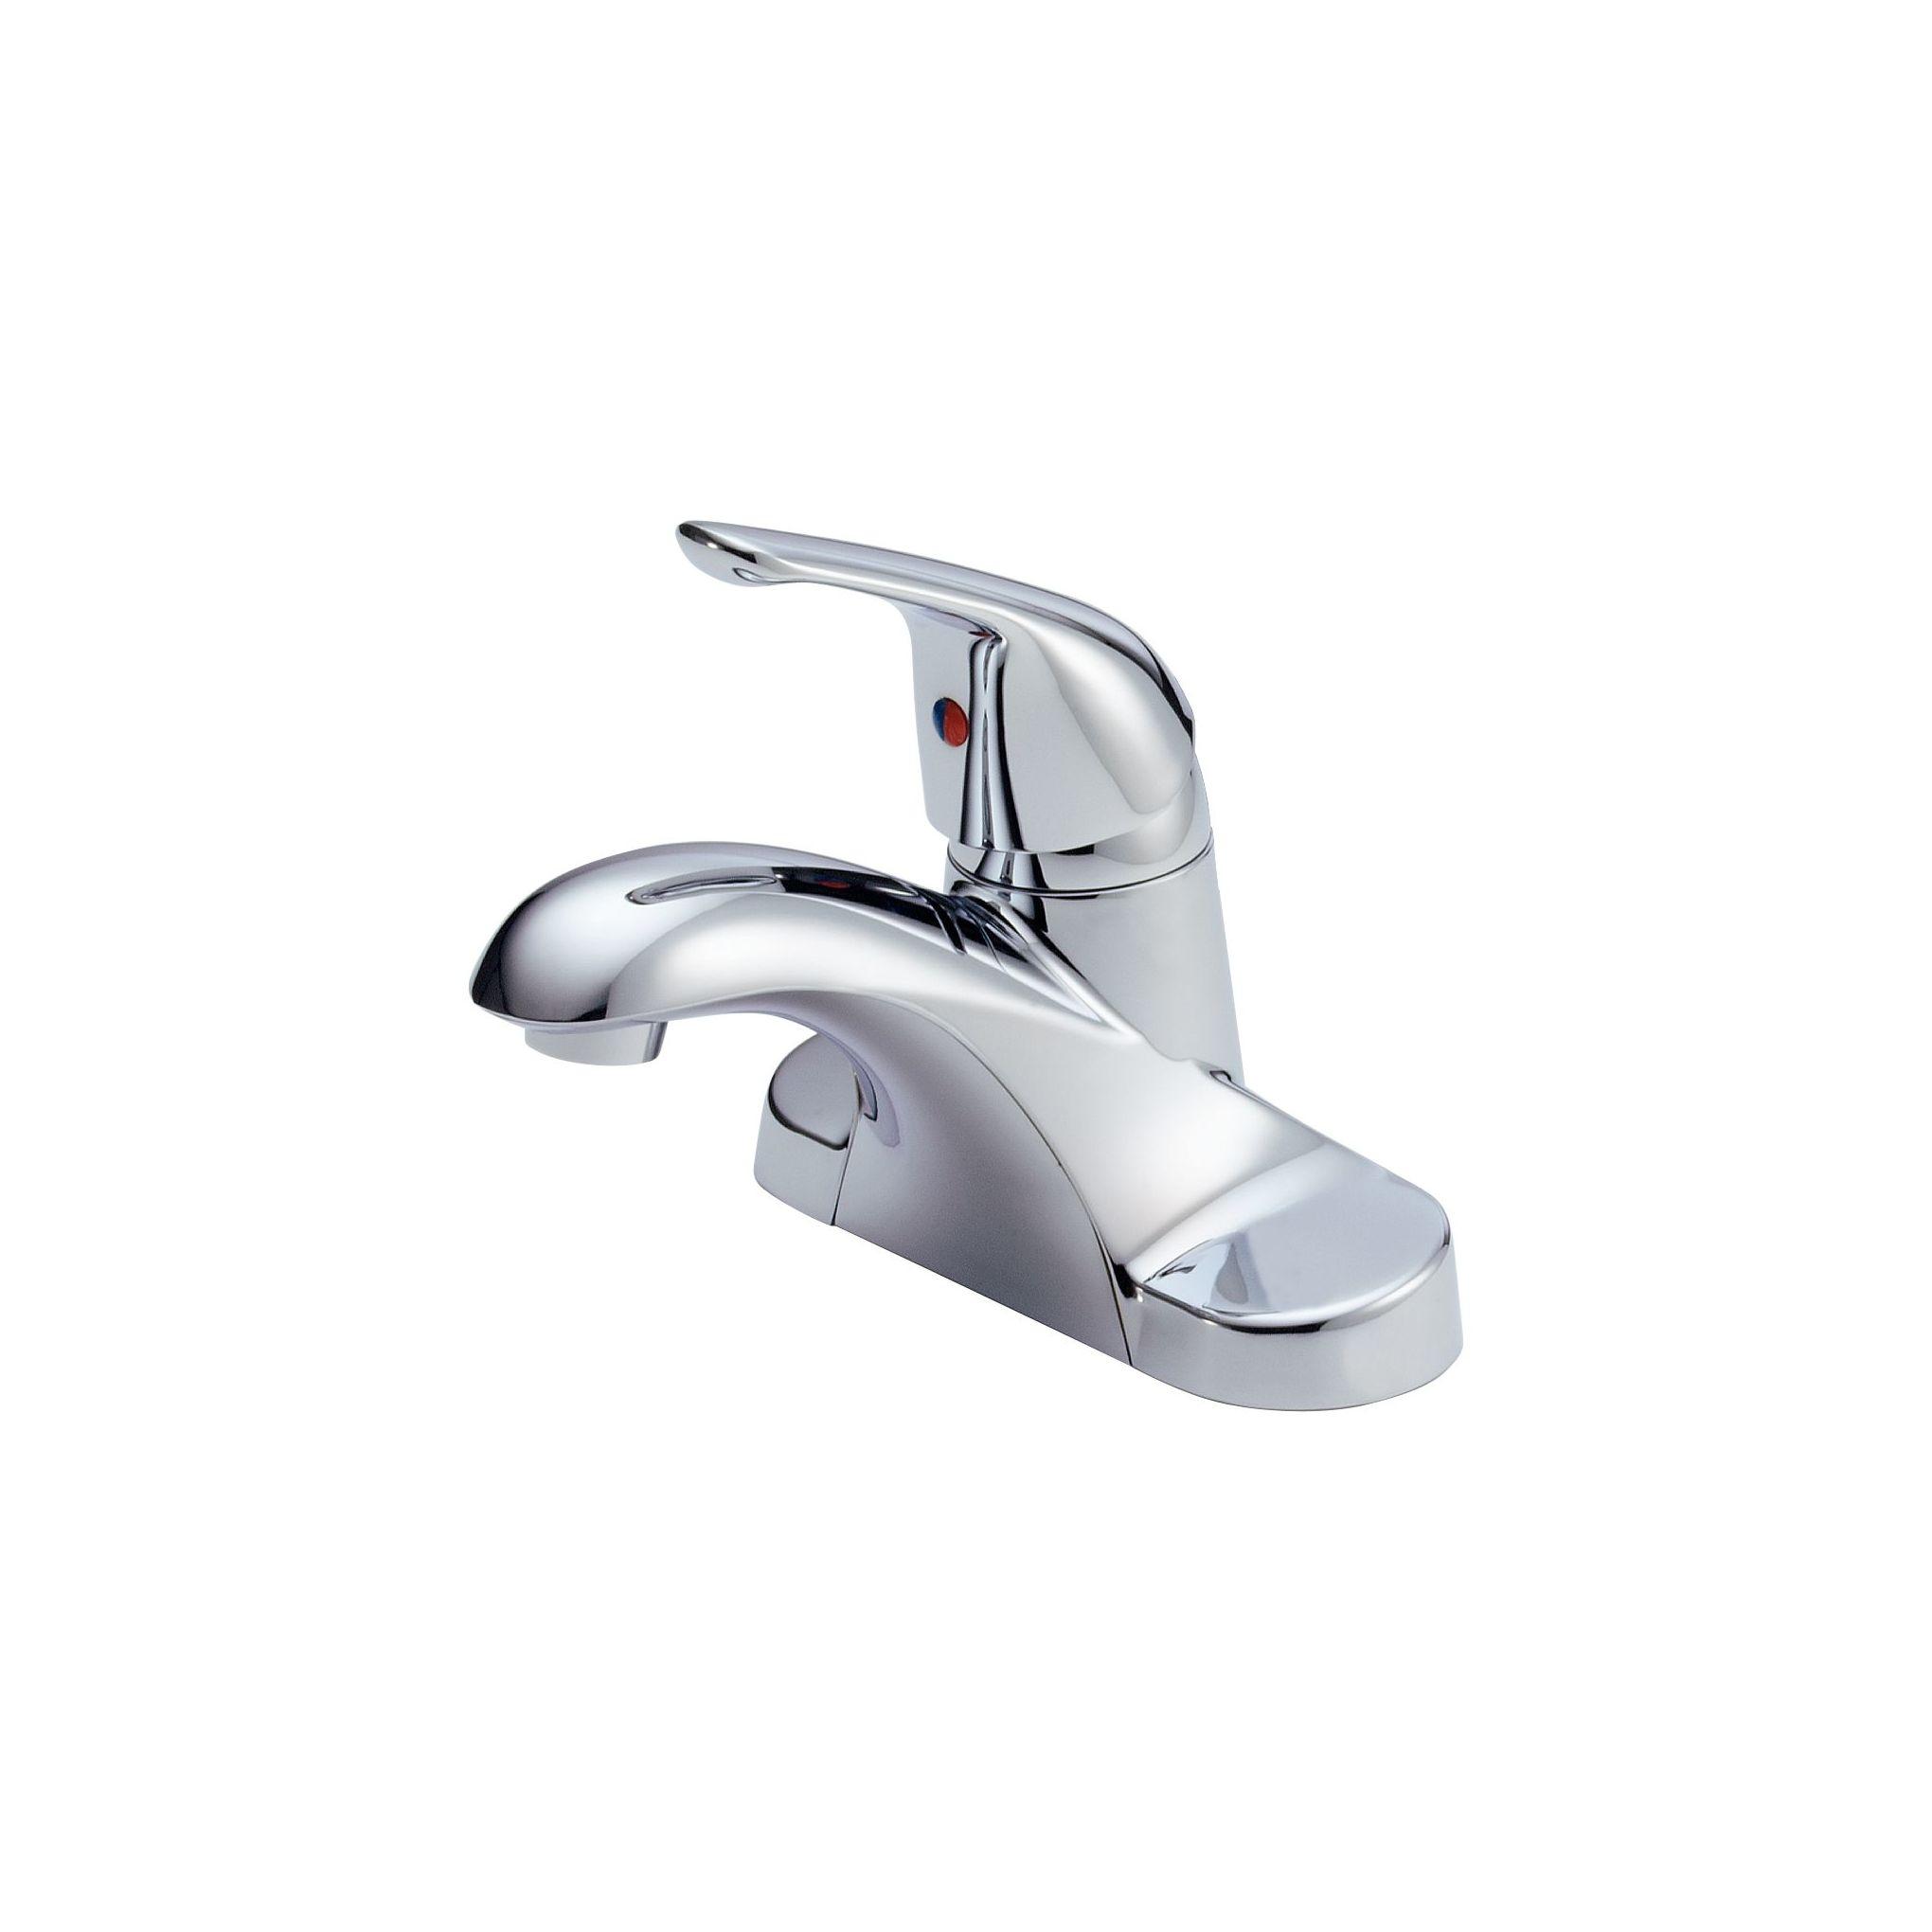 delta lavatory faucet b501lf delta lavatory faucet b501lf 24 fantastic delta single handle bathroom faucet image ideas 2040 x 2040